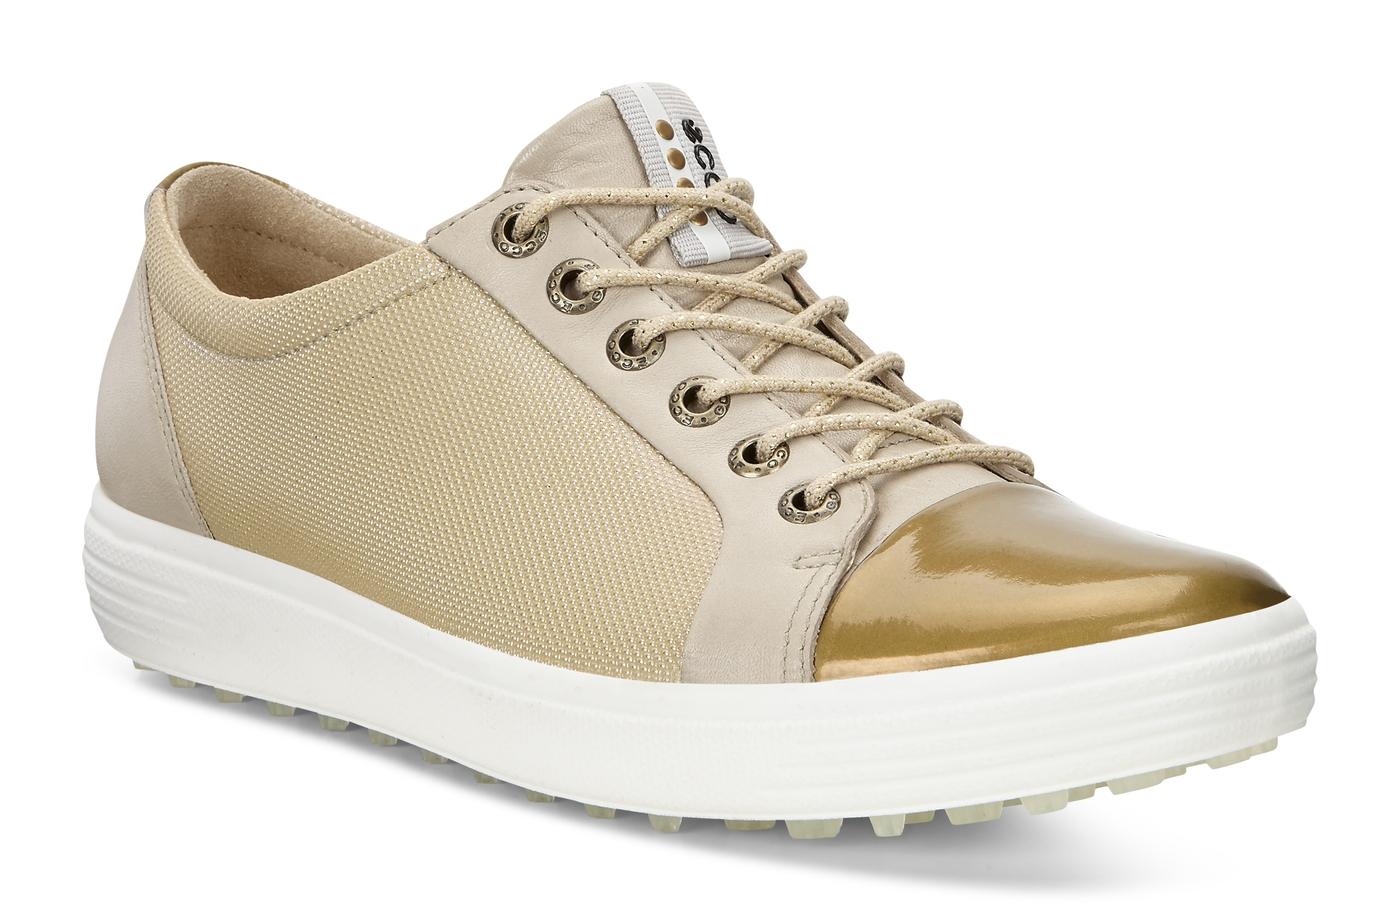 ECCO CASUAL HYBRID Golf Ladies Leather Lining